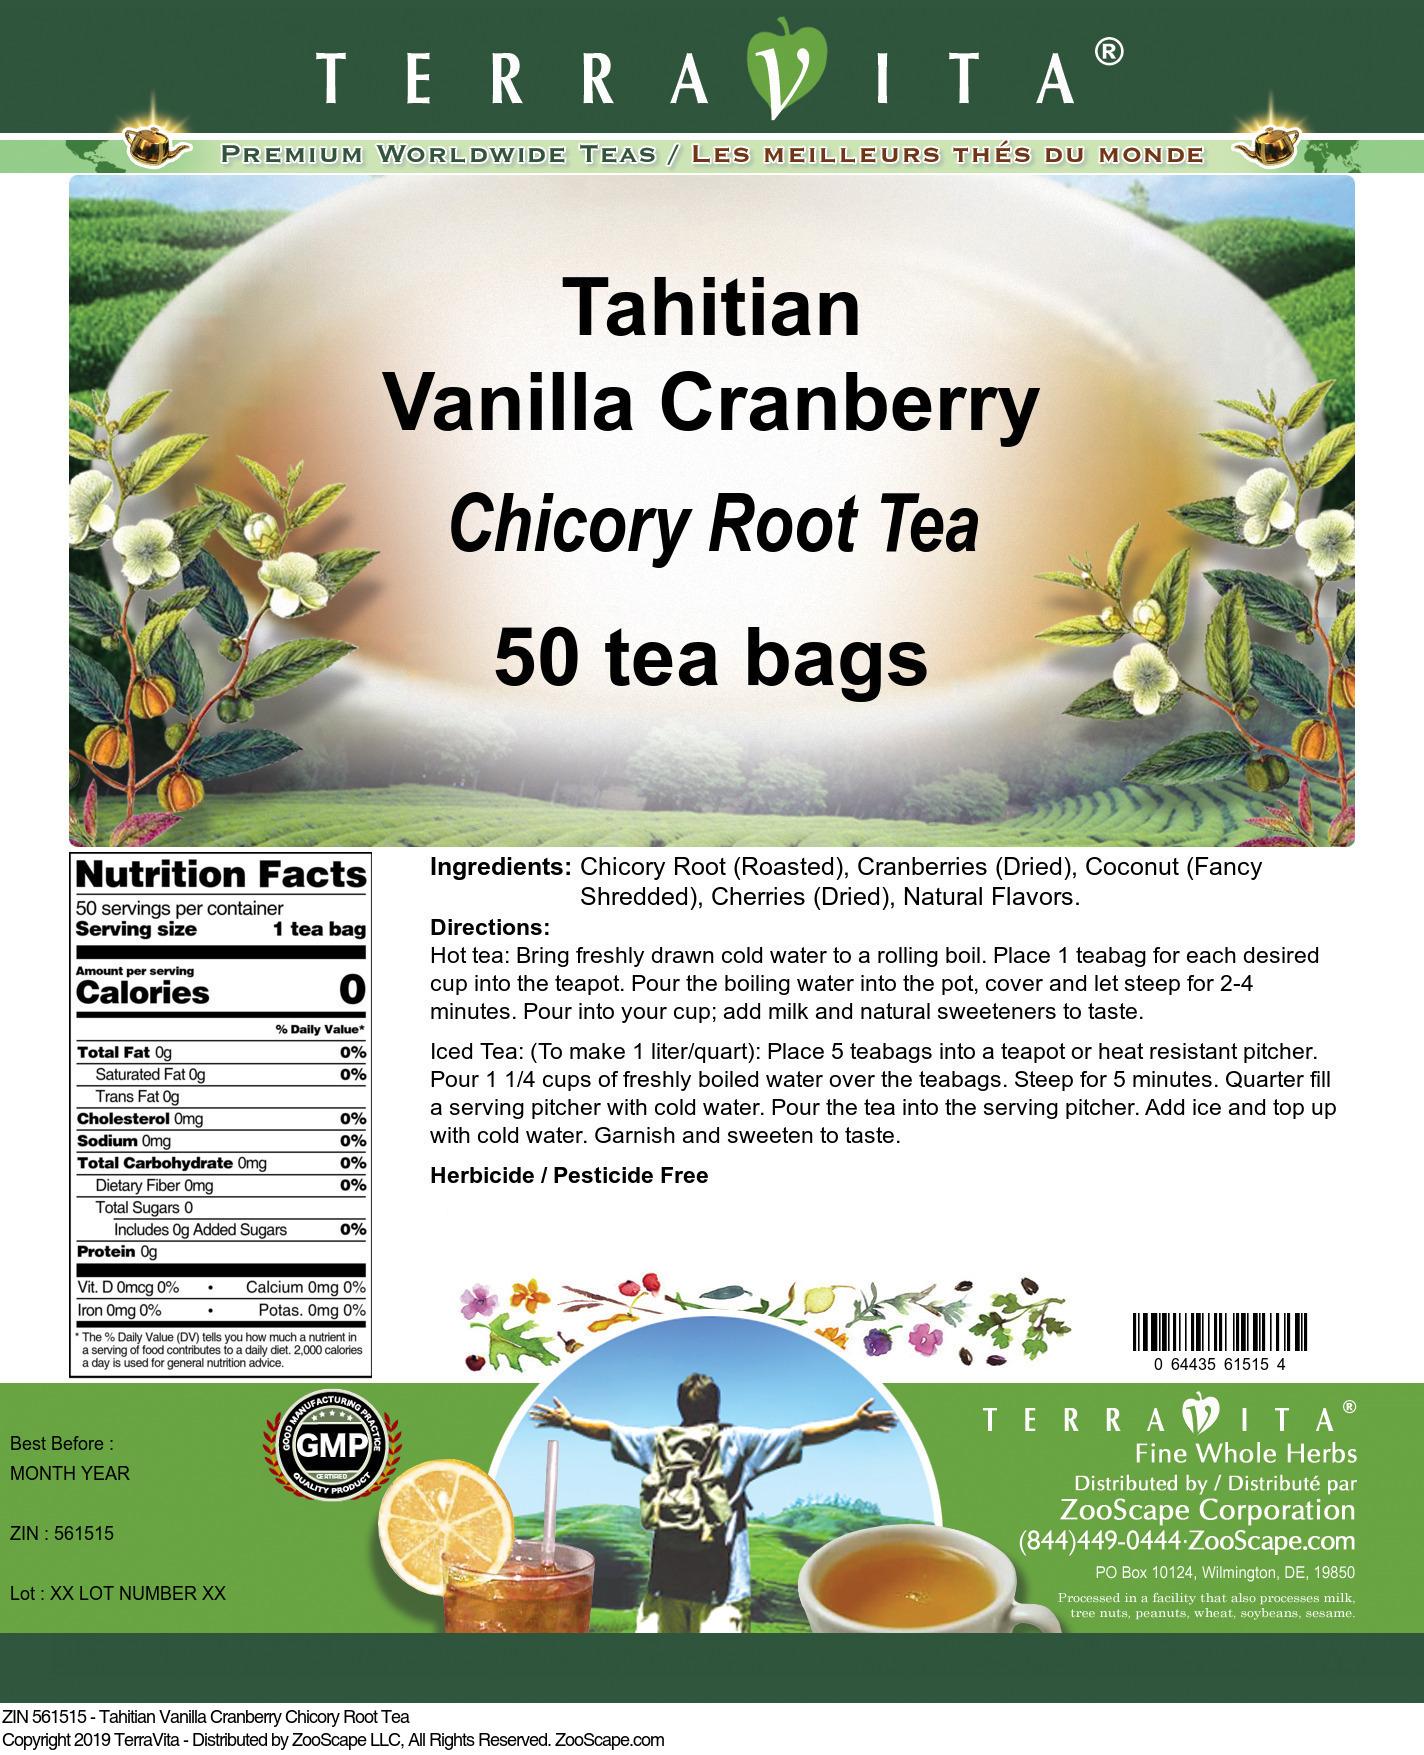 Tahitian Vanilla Cranberry Chicory Root Tea